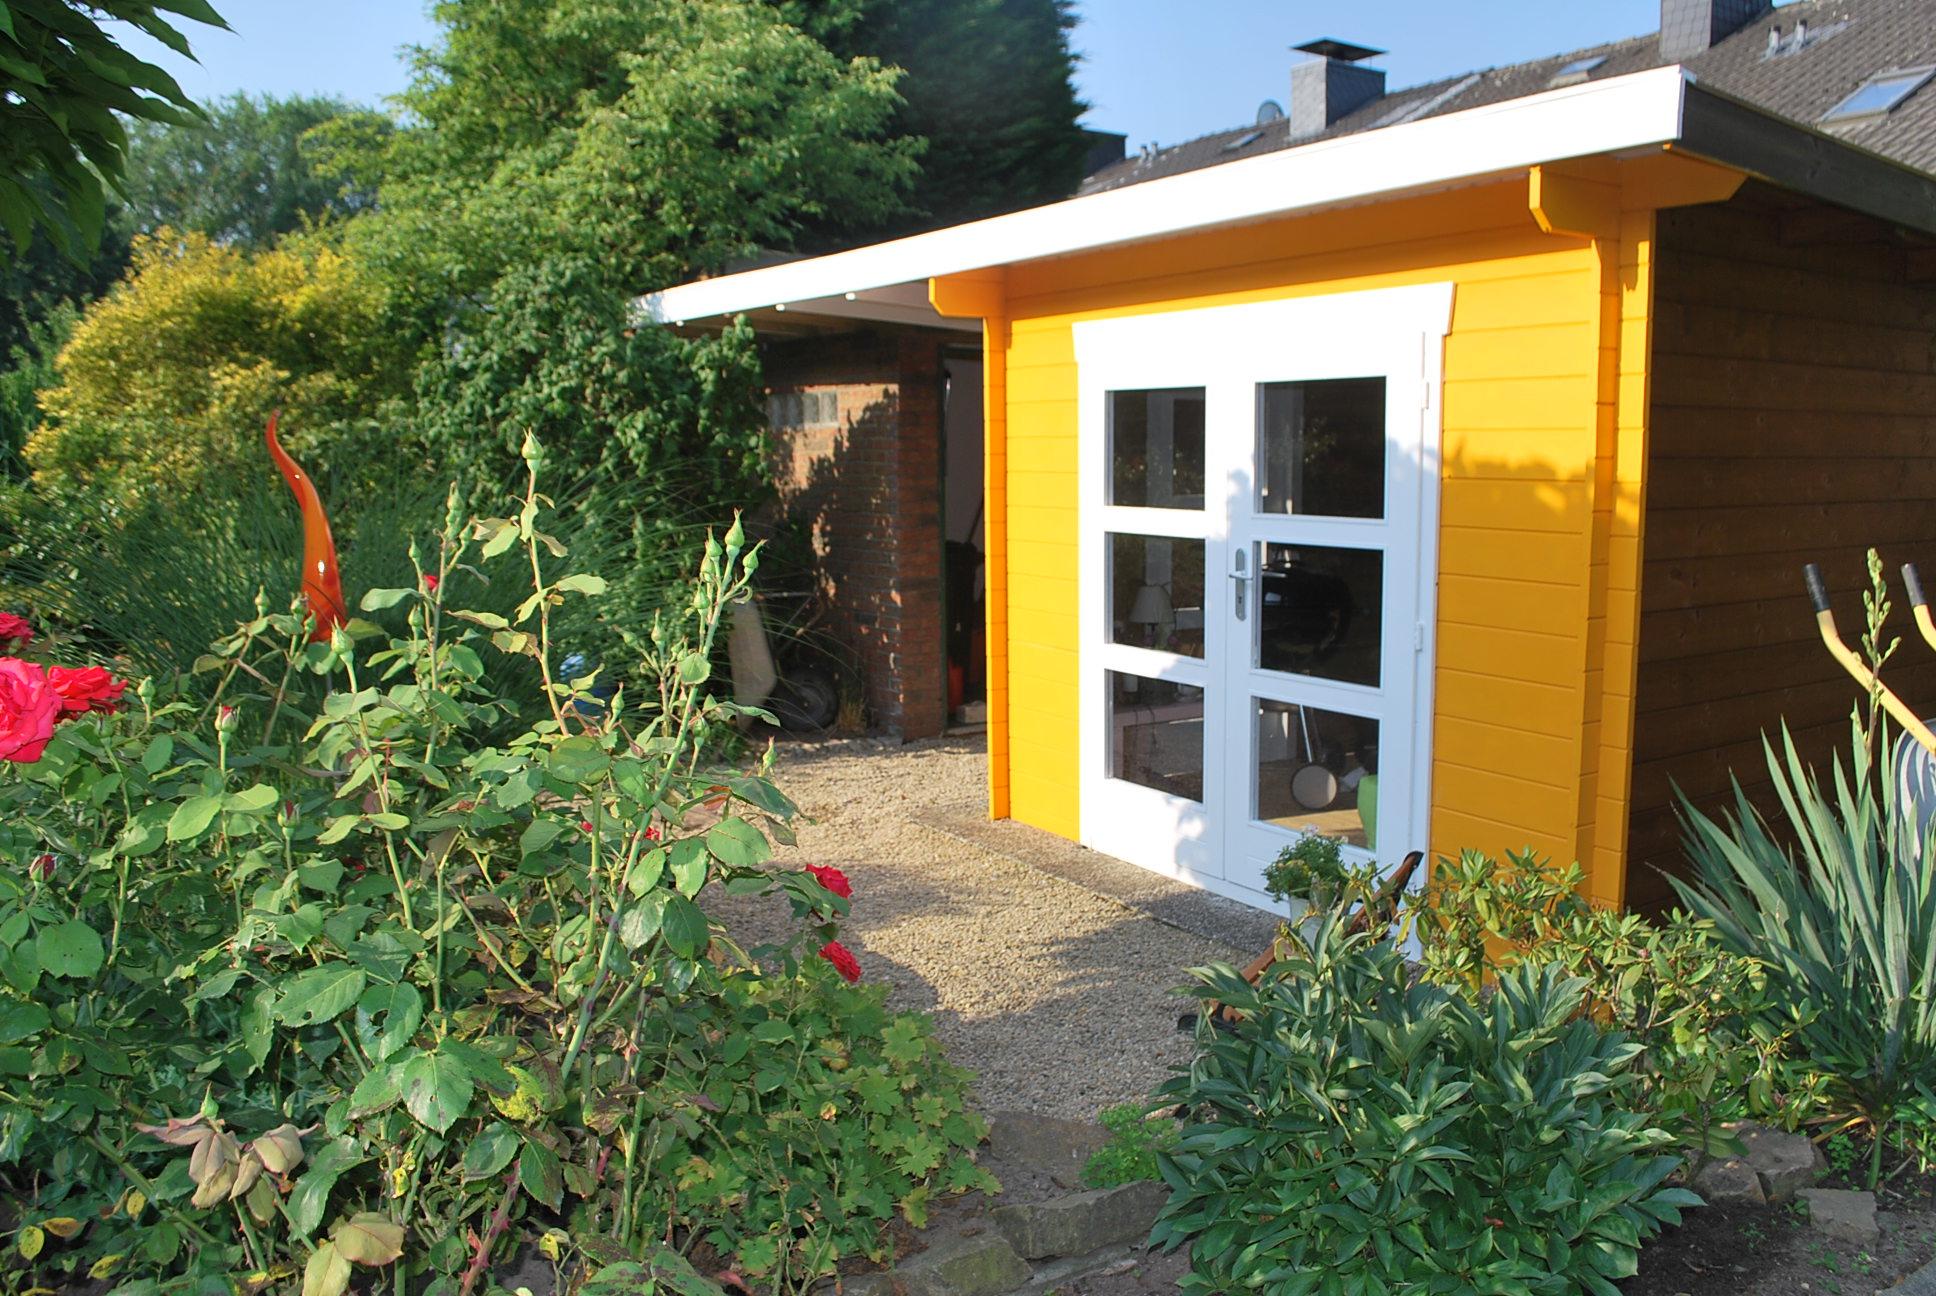 Gartenhaus nach Maß aus 40 x 96 mm Bohlen